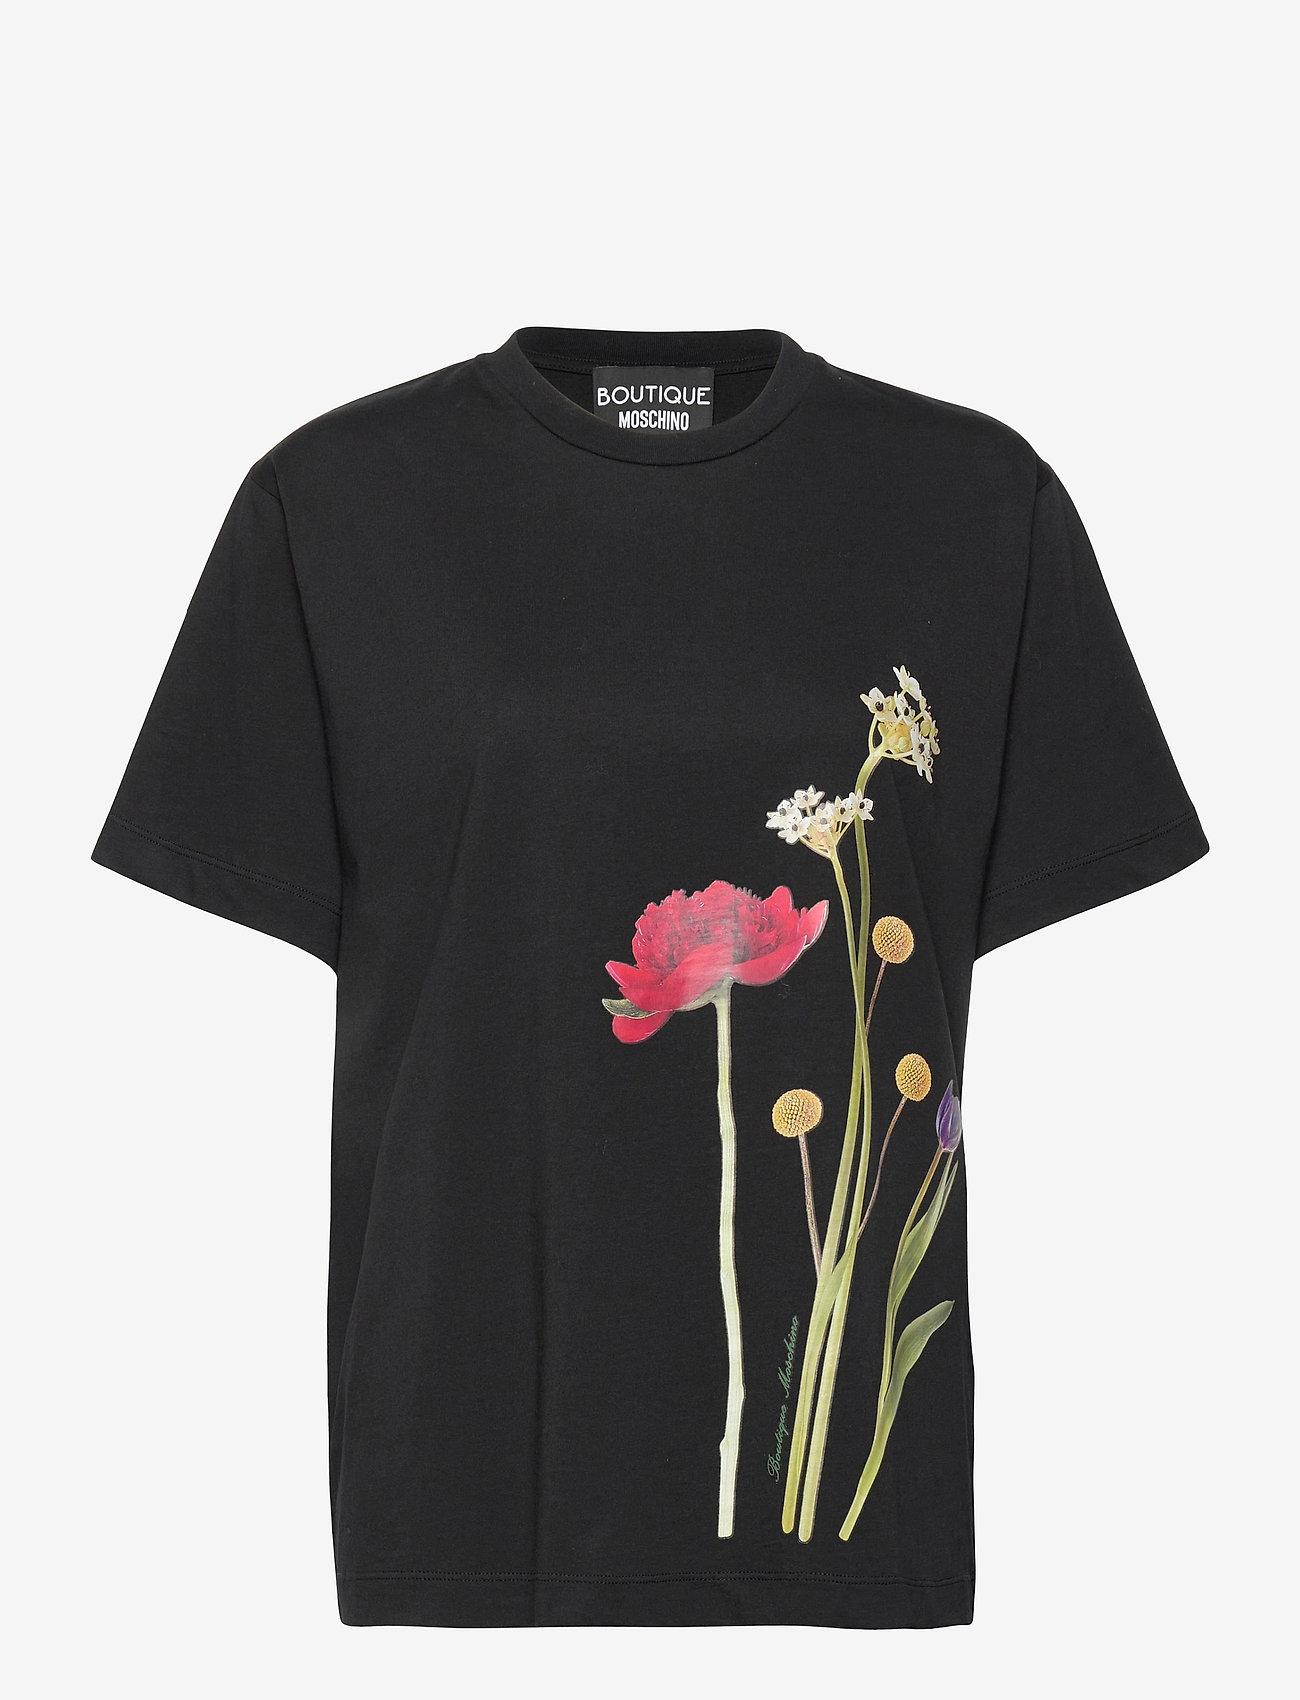 Boutique Moschino - BOTANIC T-SHIRT - t-shirts - black fantasy print - 0